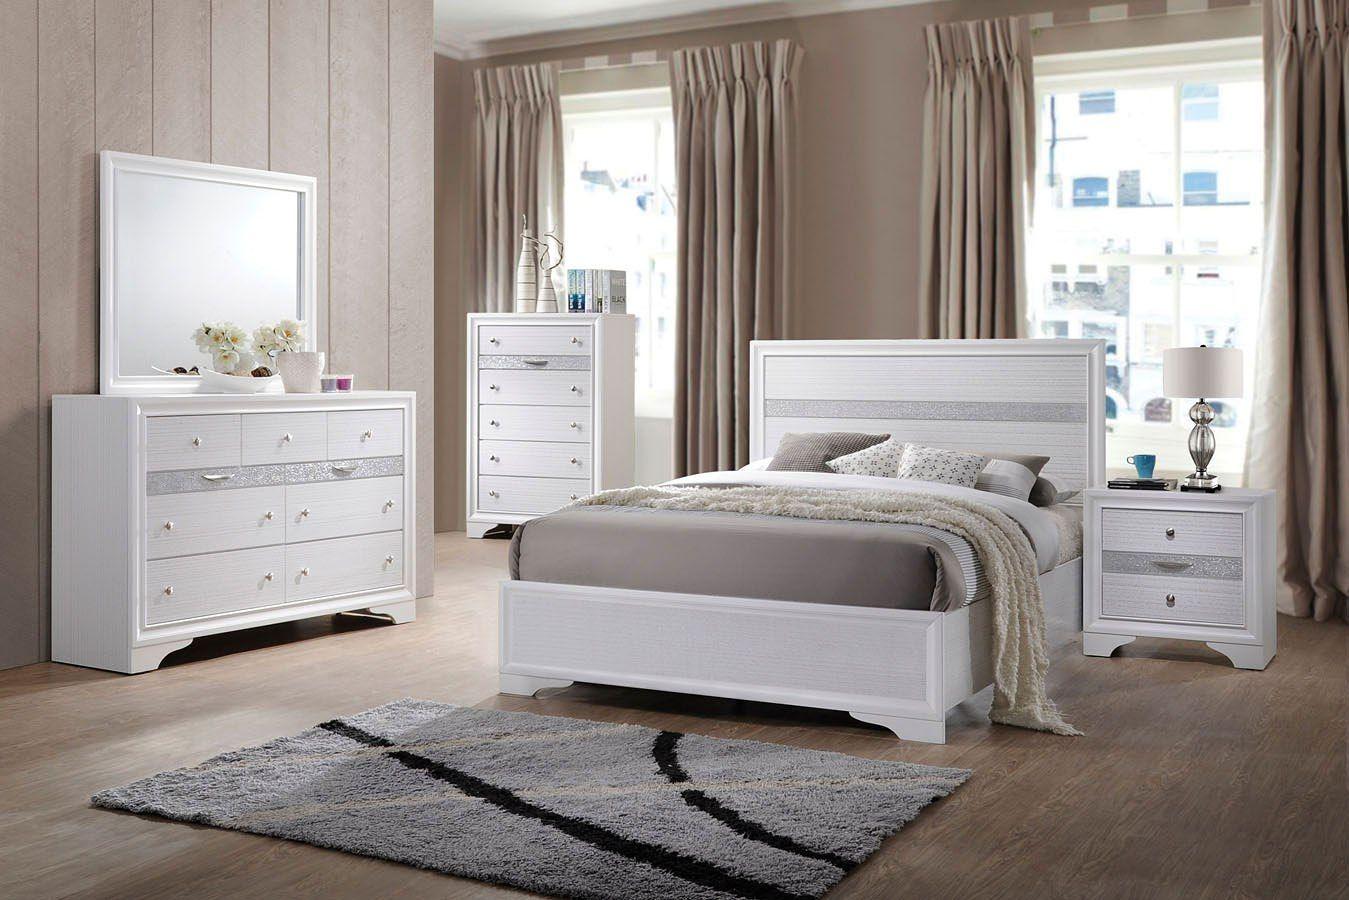 Naima Youth Panel Bedroom Set (White) White bedroom set